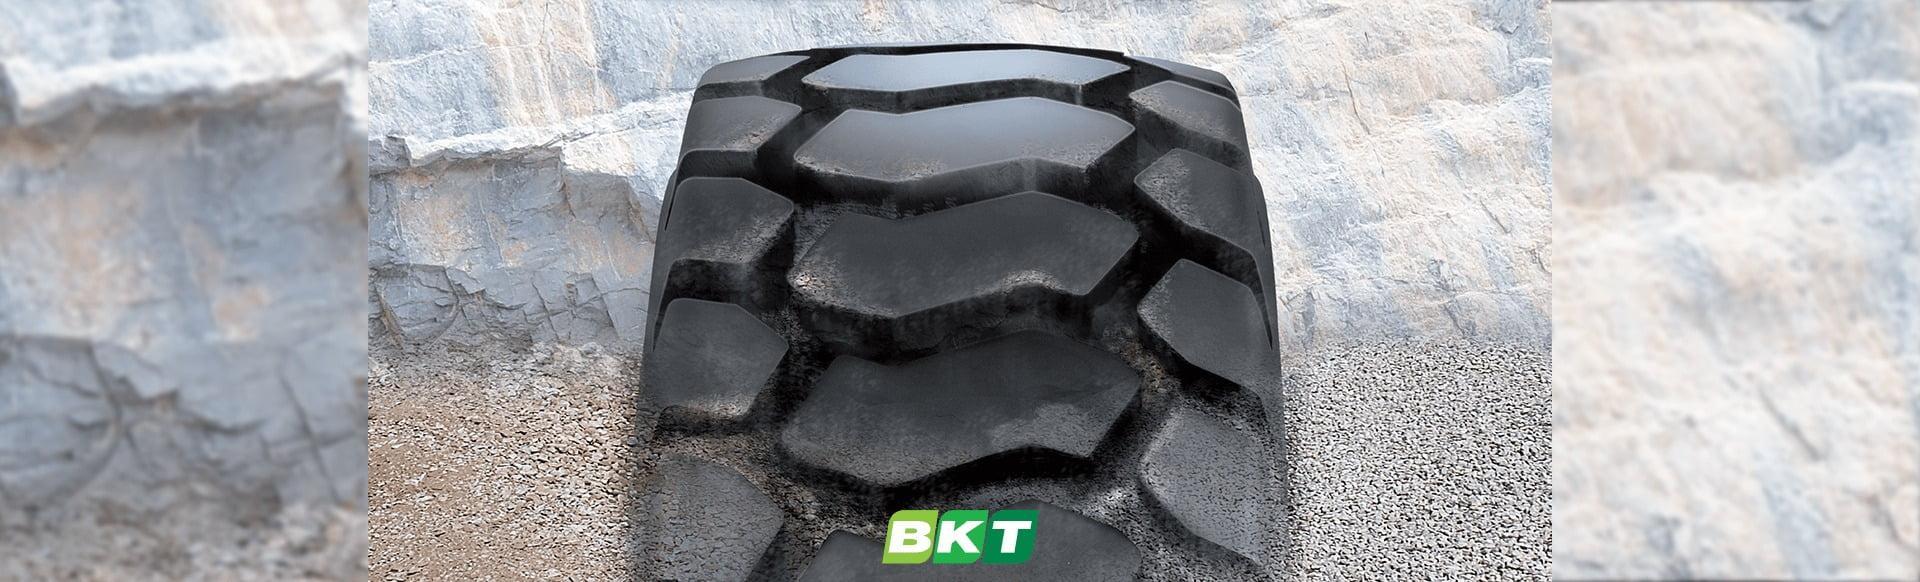 renova g pnevmatike 005